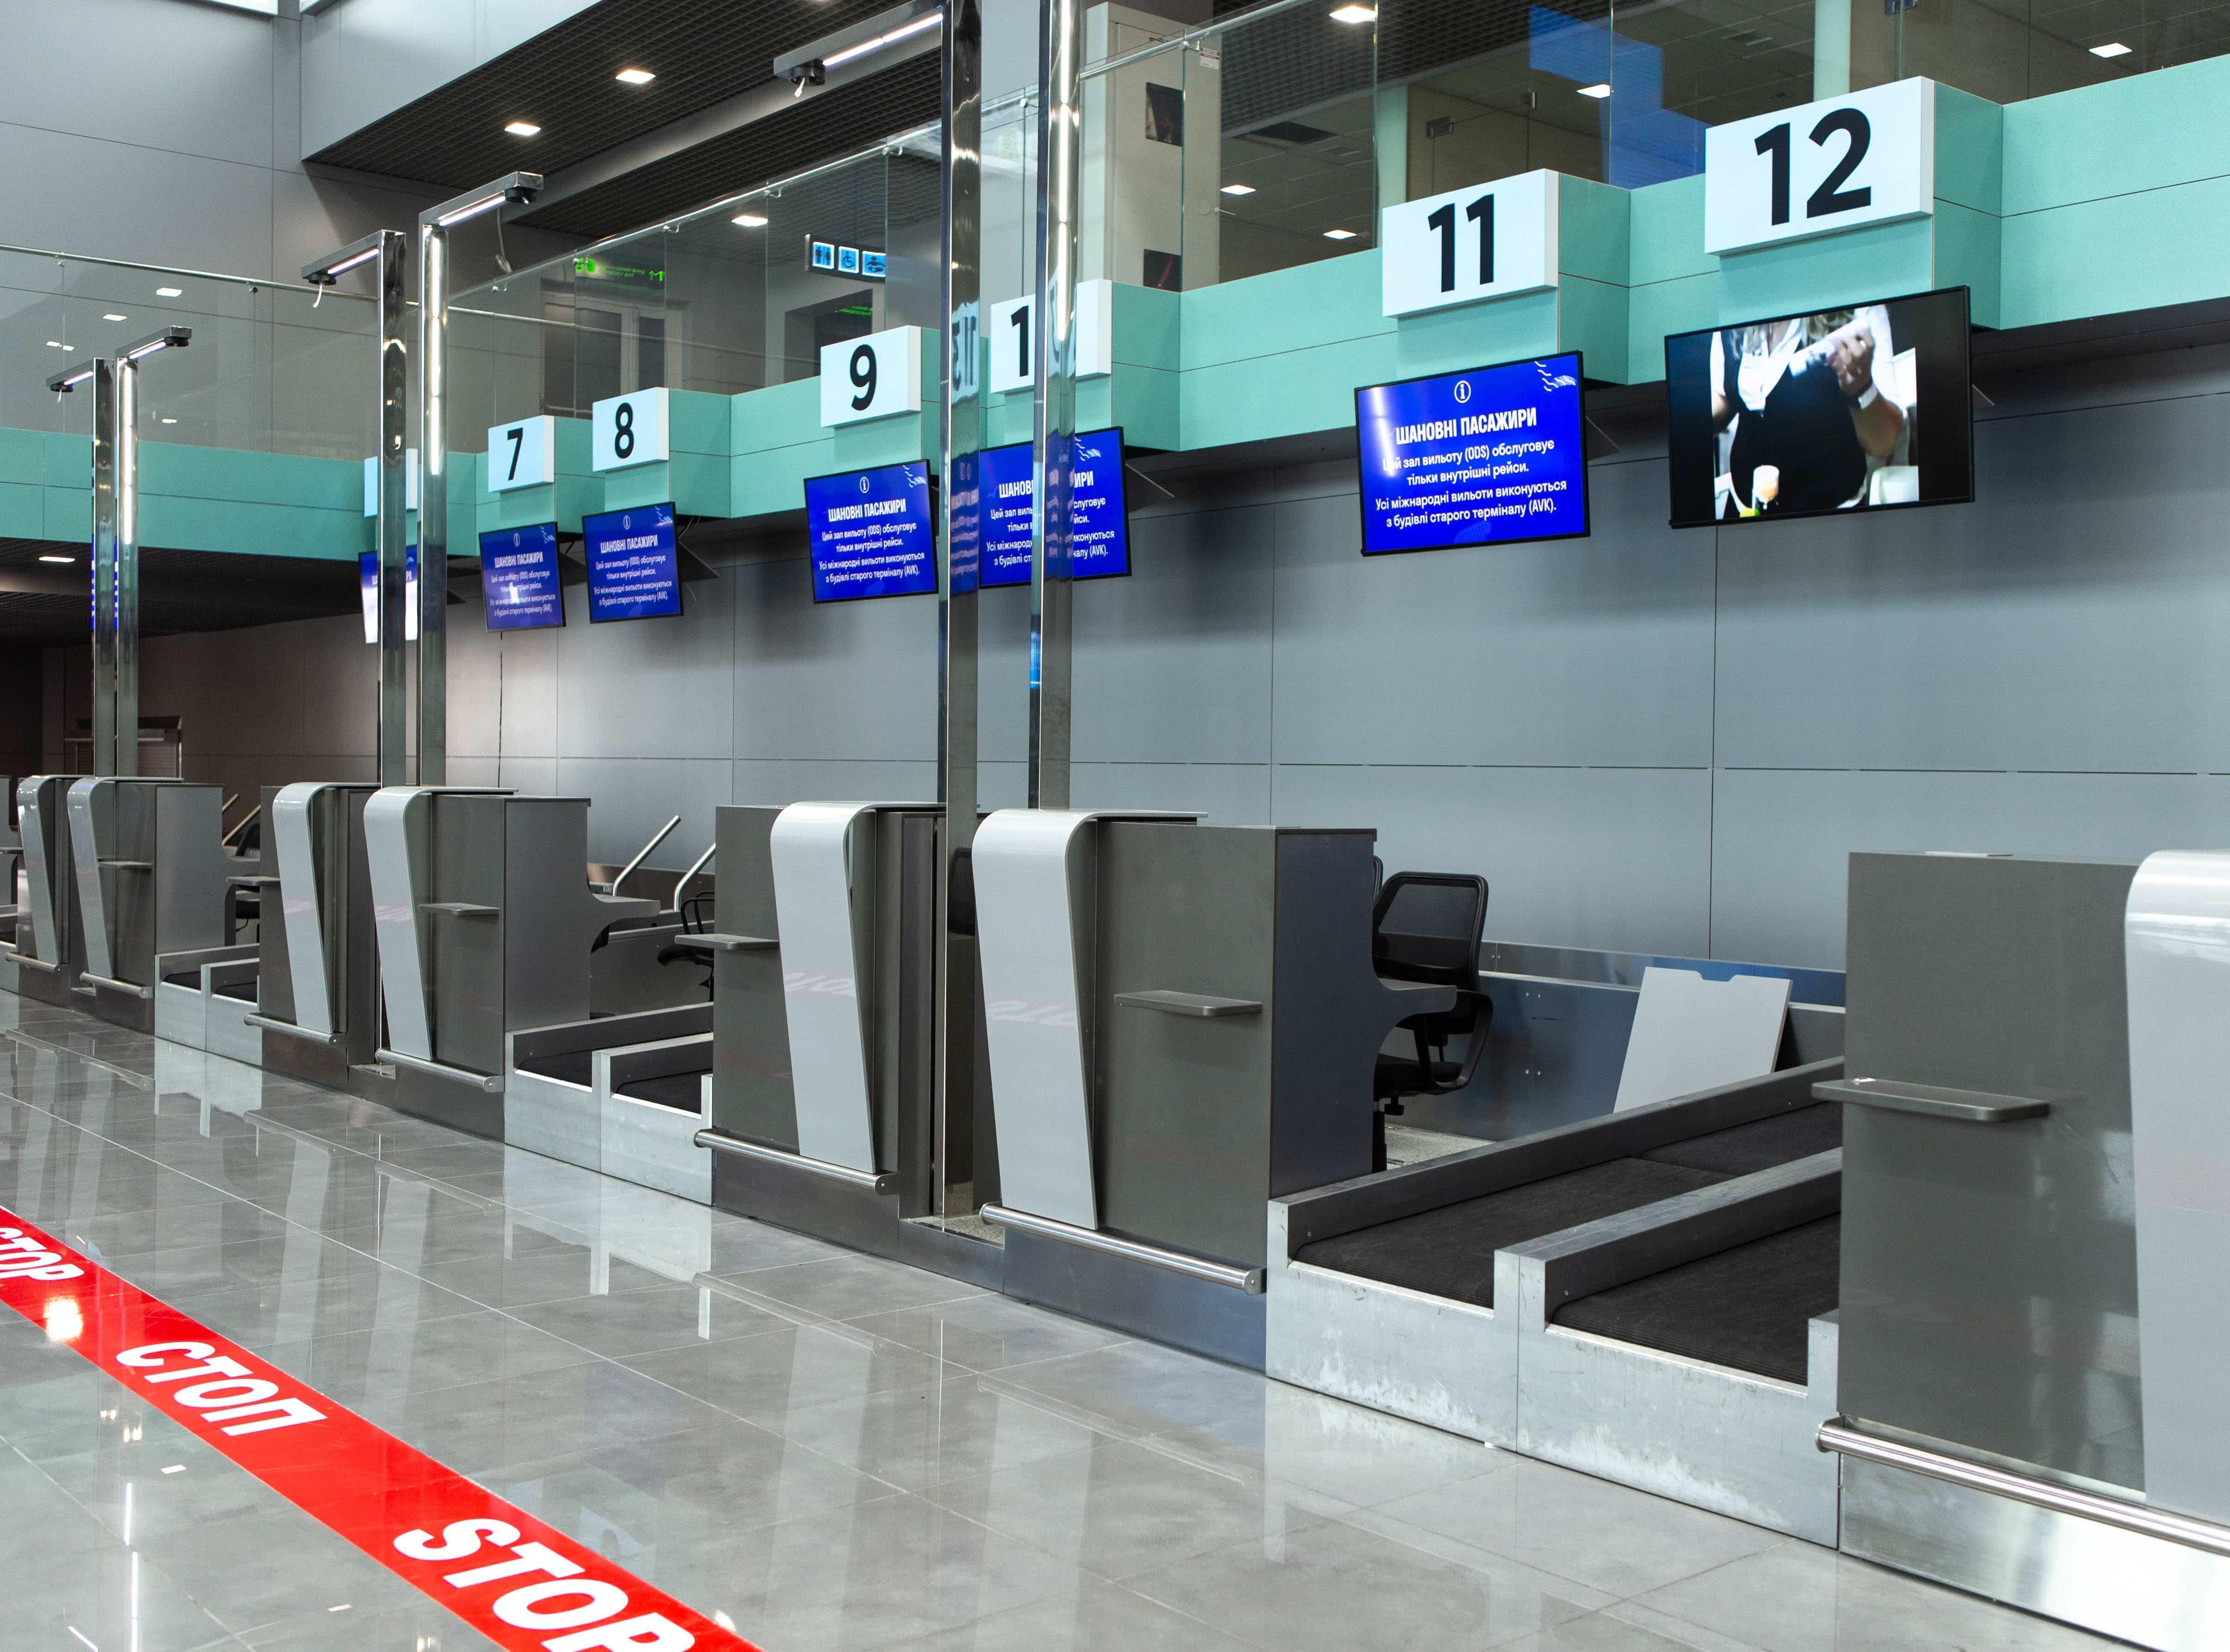 skyup-airlines-zminyuye-terminal-vilotu-u-mizhnarodnomu-aeroportu-odesa